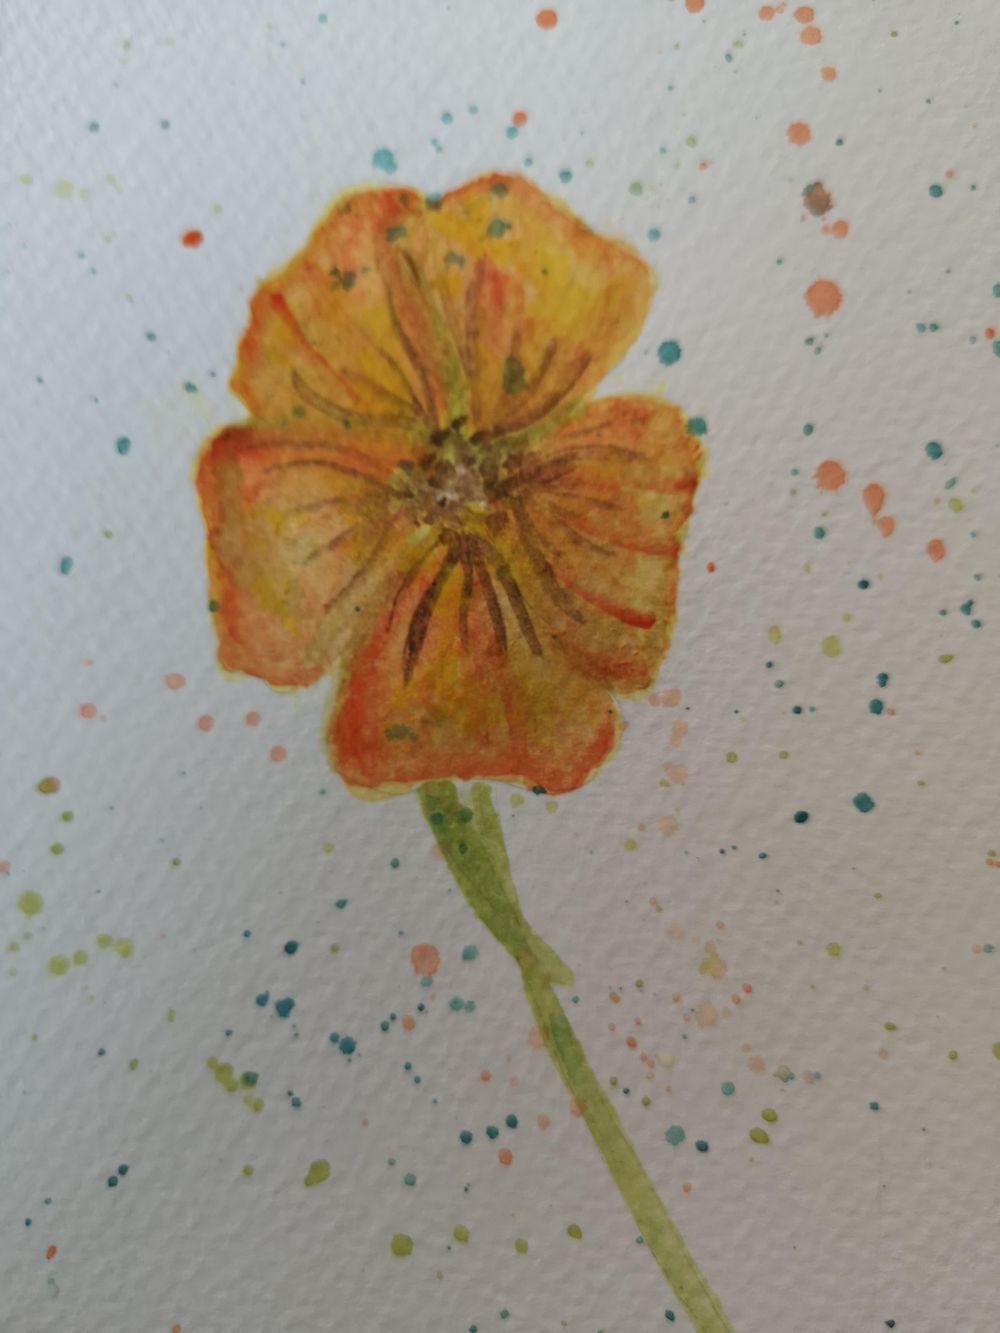 Rumena rožica - image 1 - student project